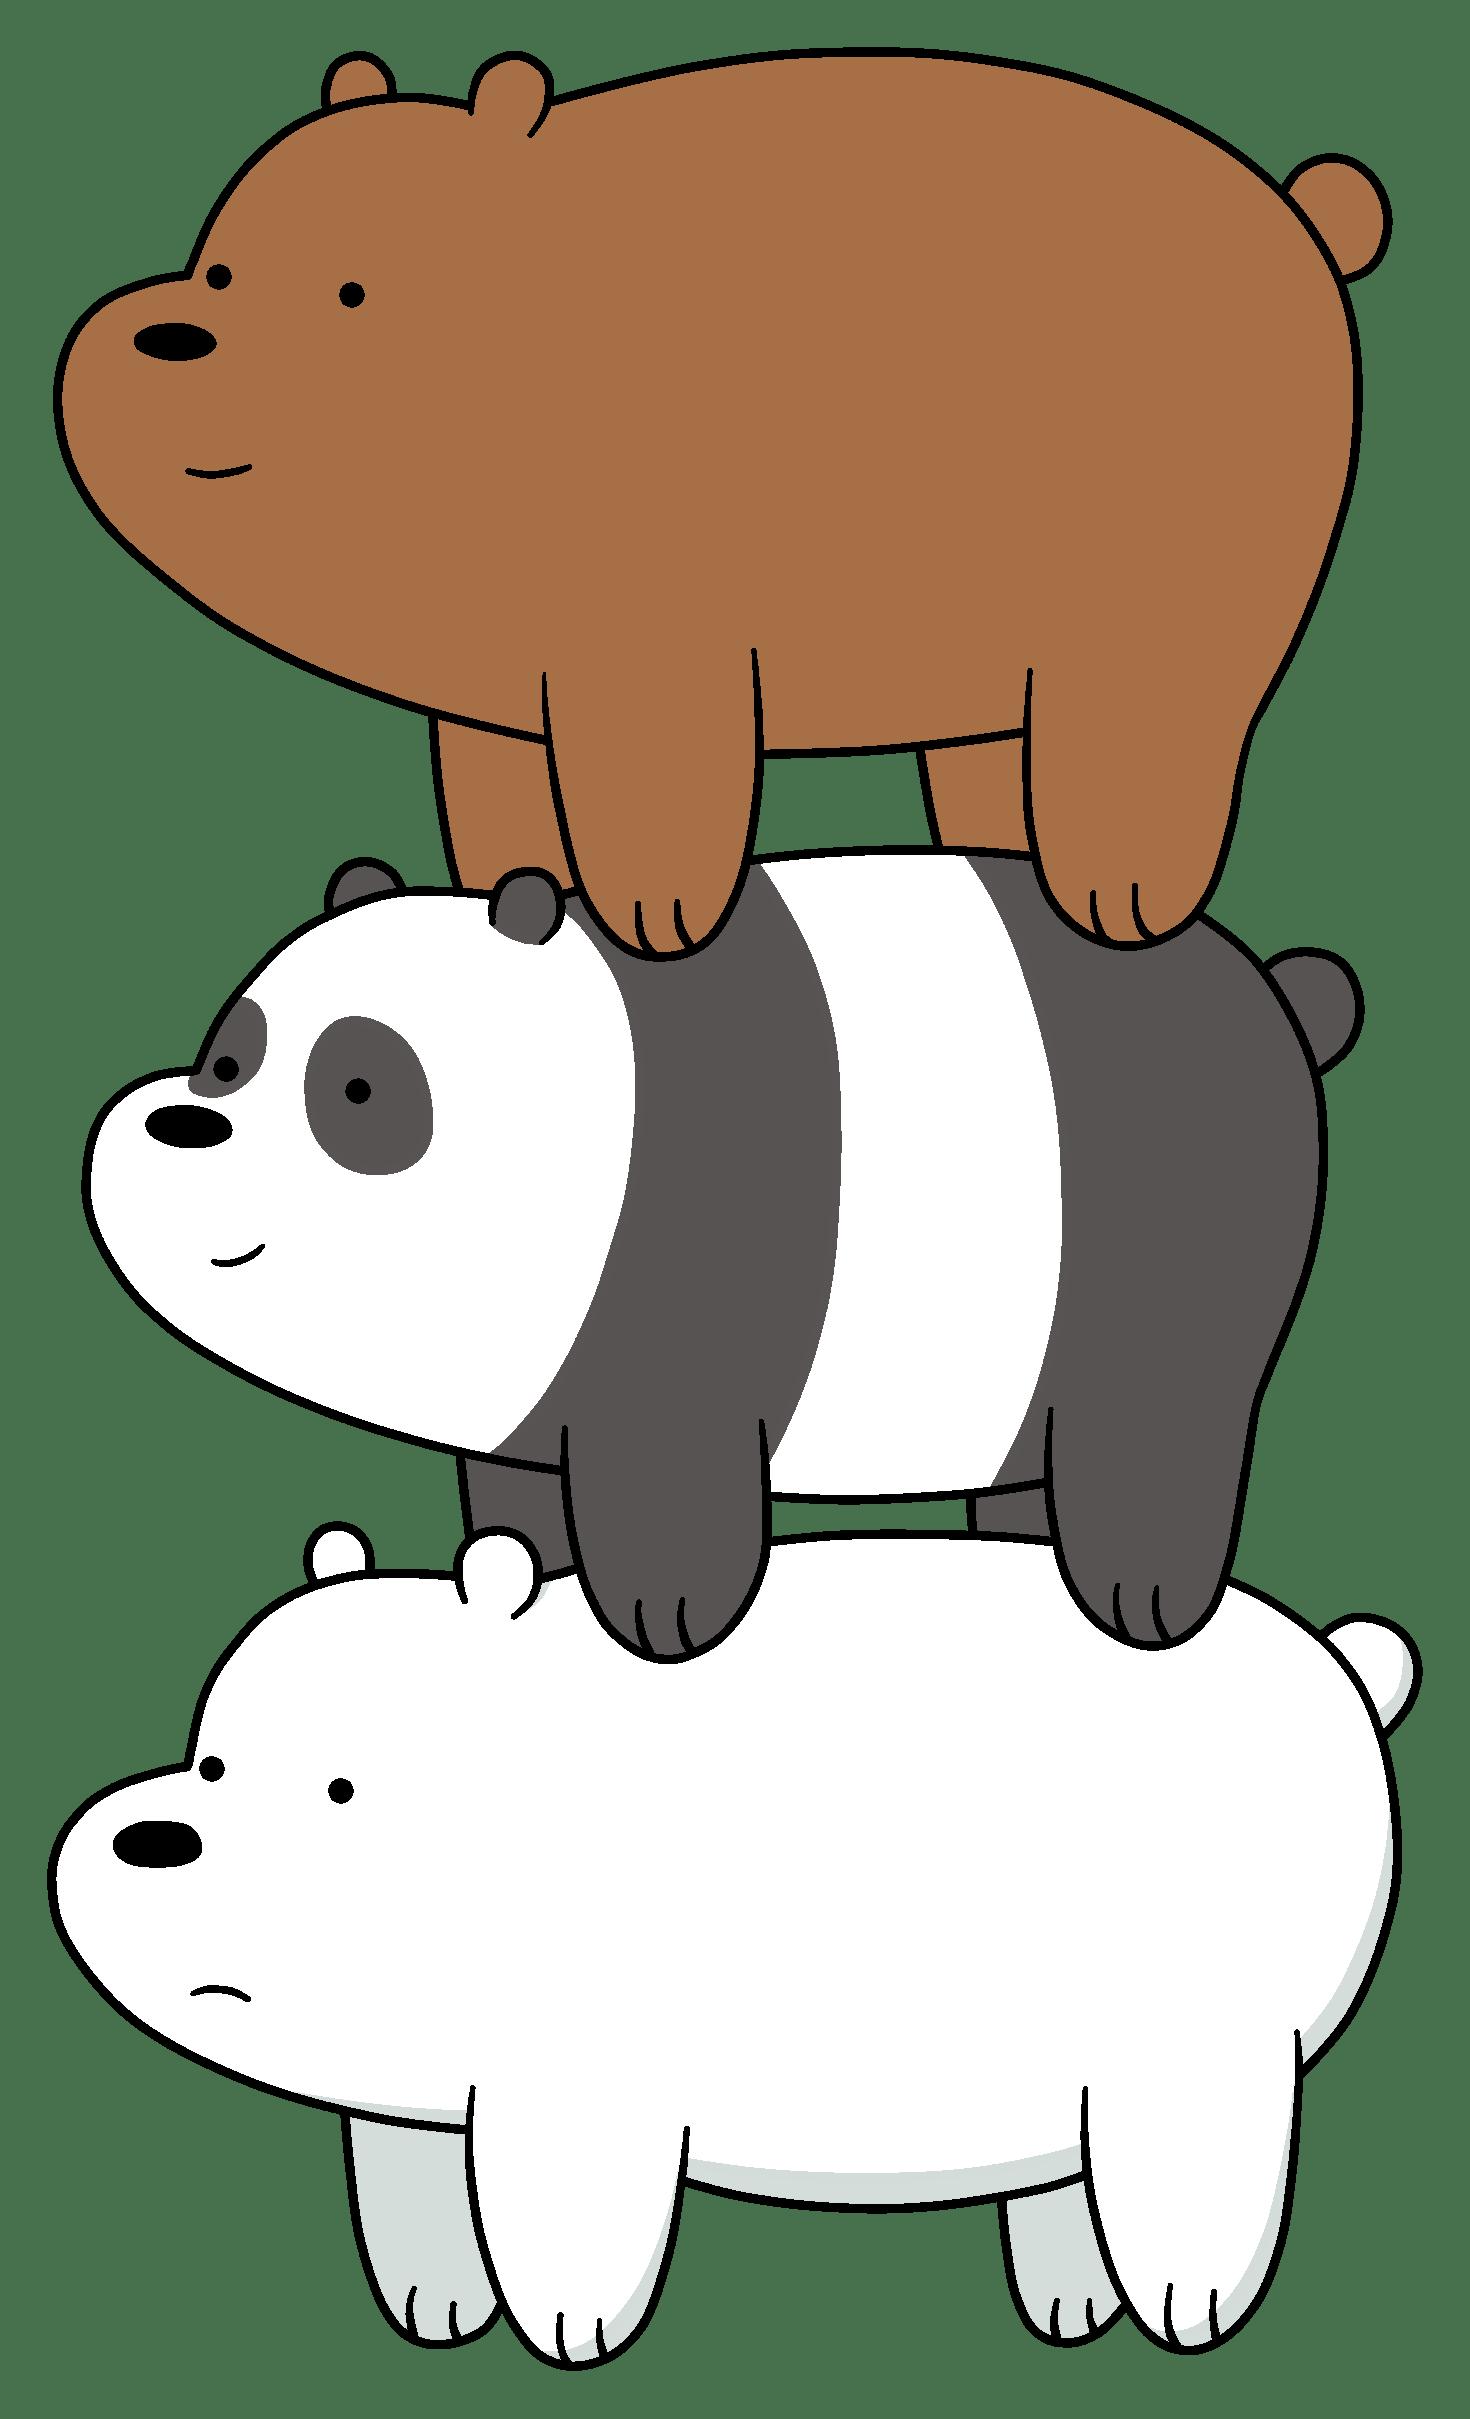 Pin By Kimberlyn Betancourt On Escandalosos We Bare Bears Wallpapers Bare Bears Cute Panda Wallpaper